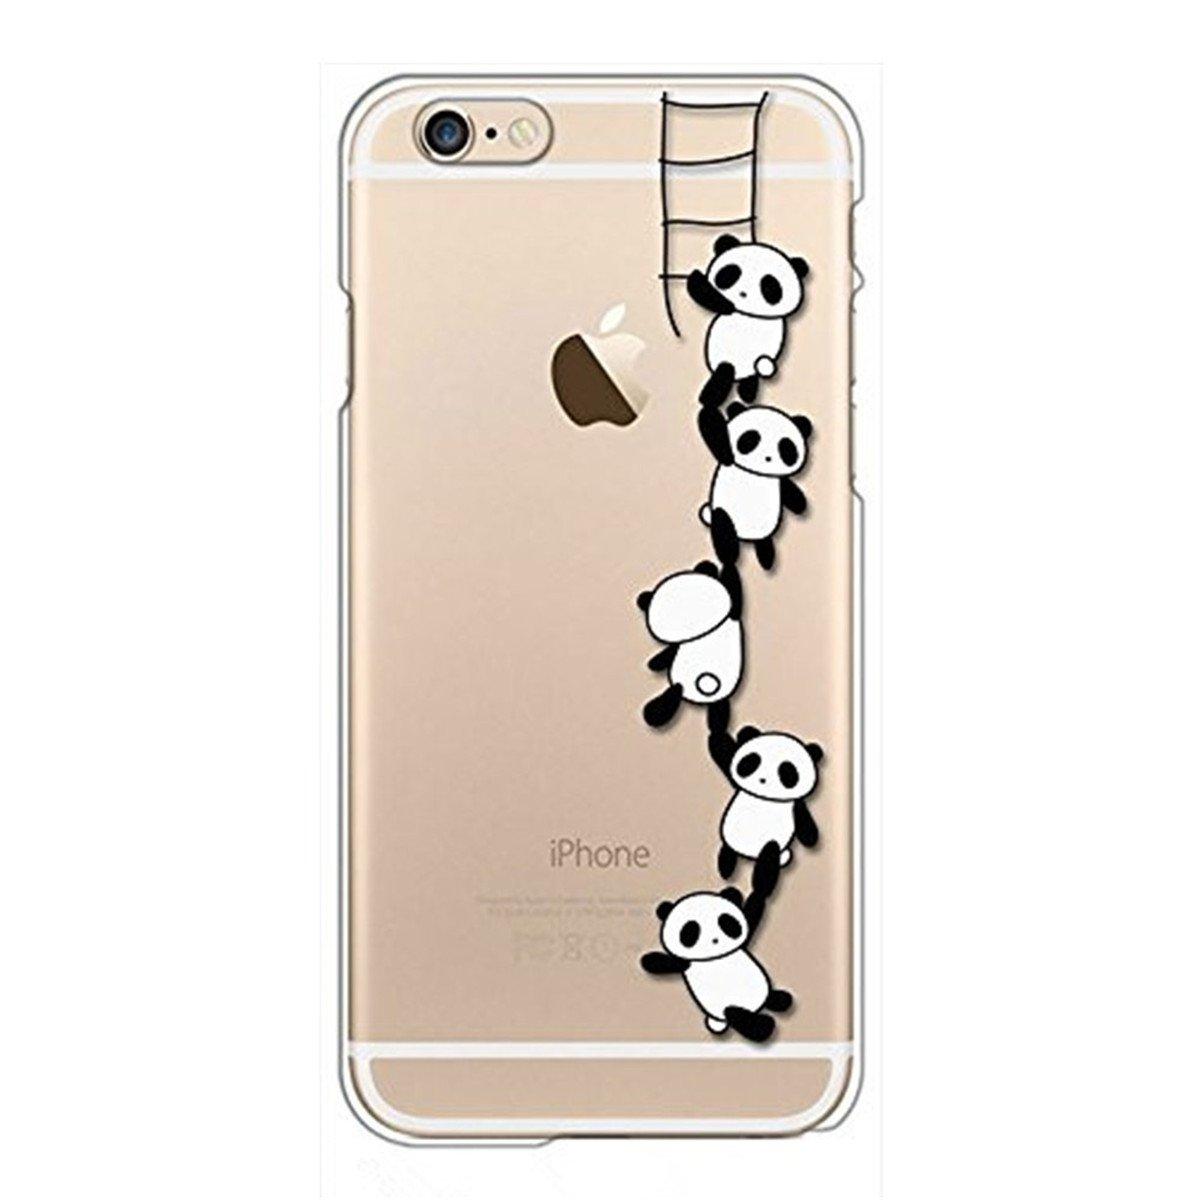 classic fit 1122b fe457 Case Compatible with iPhone 6s Plus Case, iPhone 6 Plus Case Panda Clear  Transparent TPU Cover iPhone 6 Plus